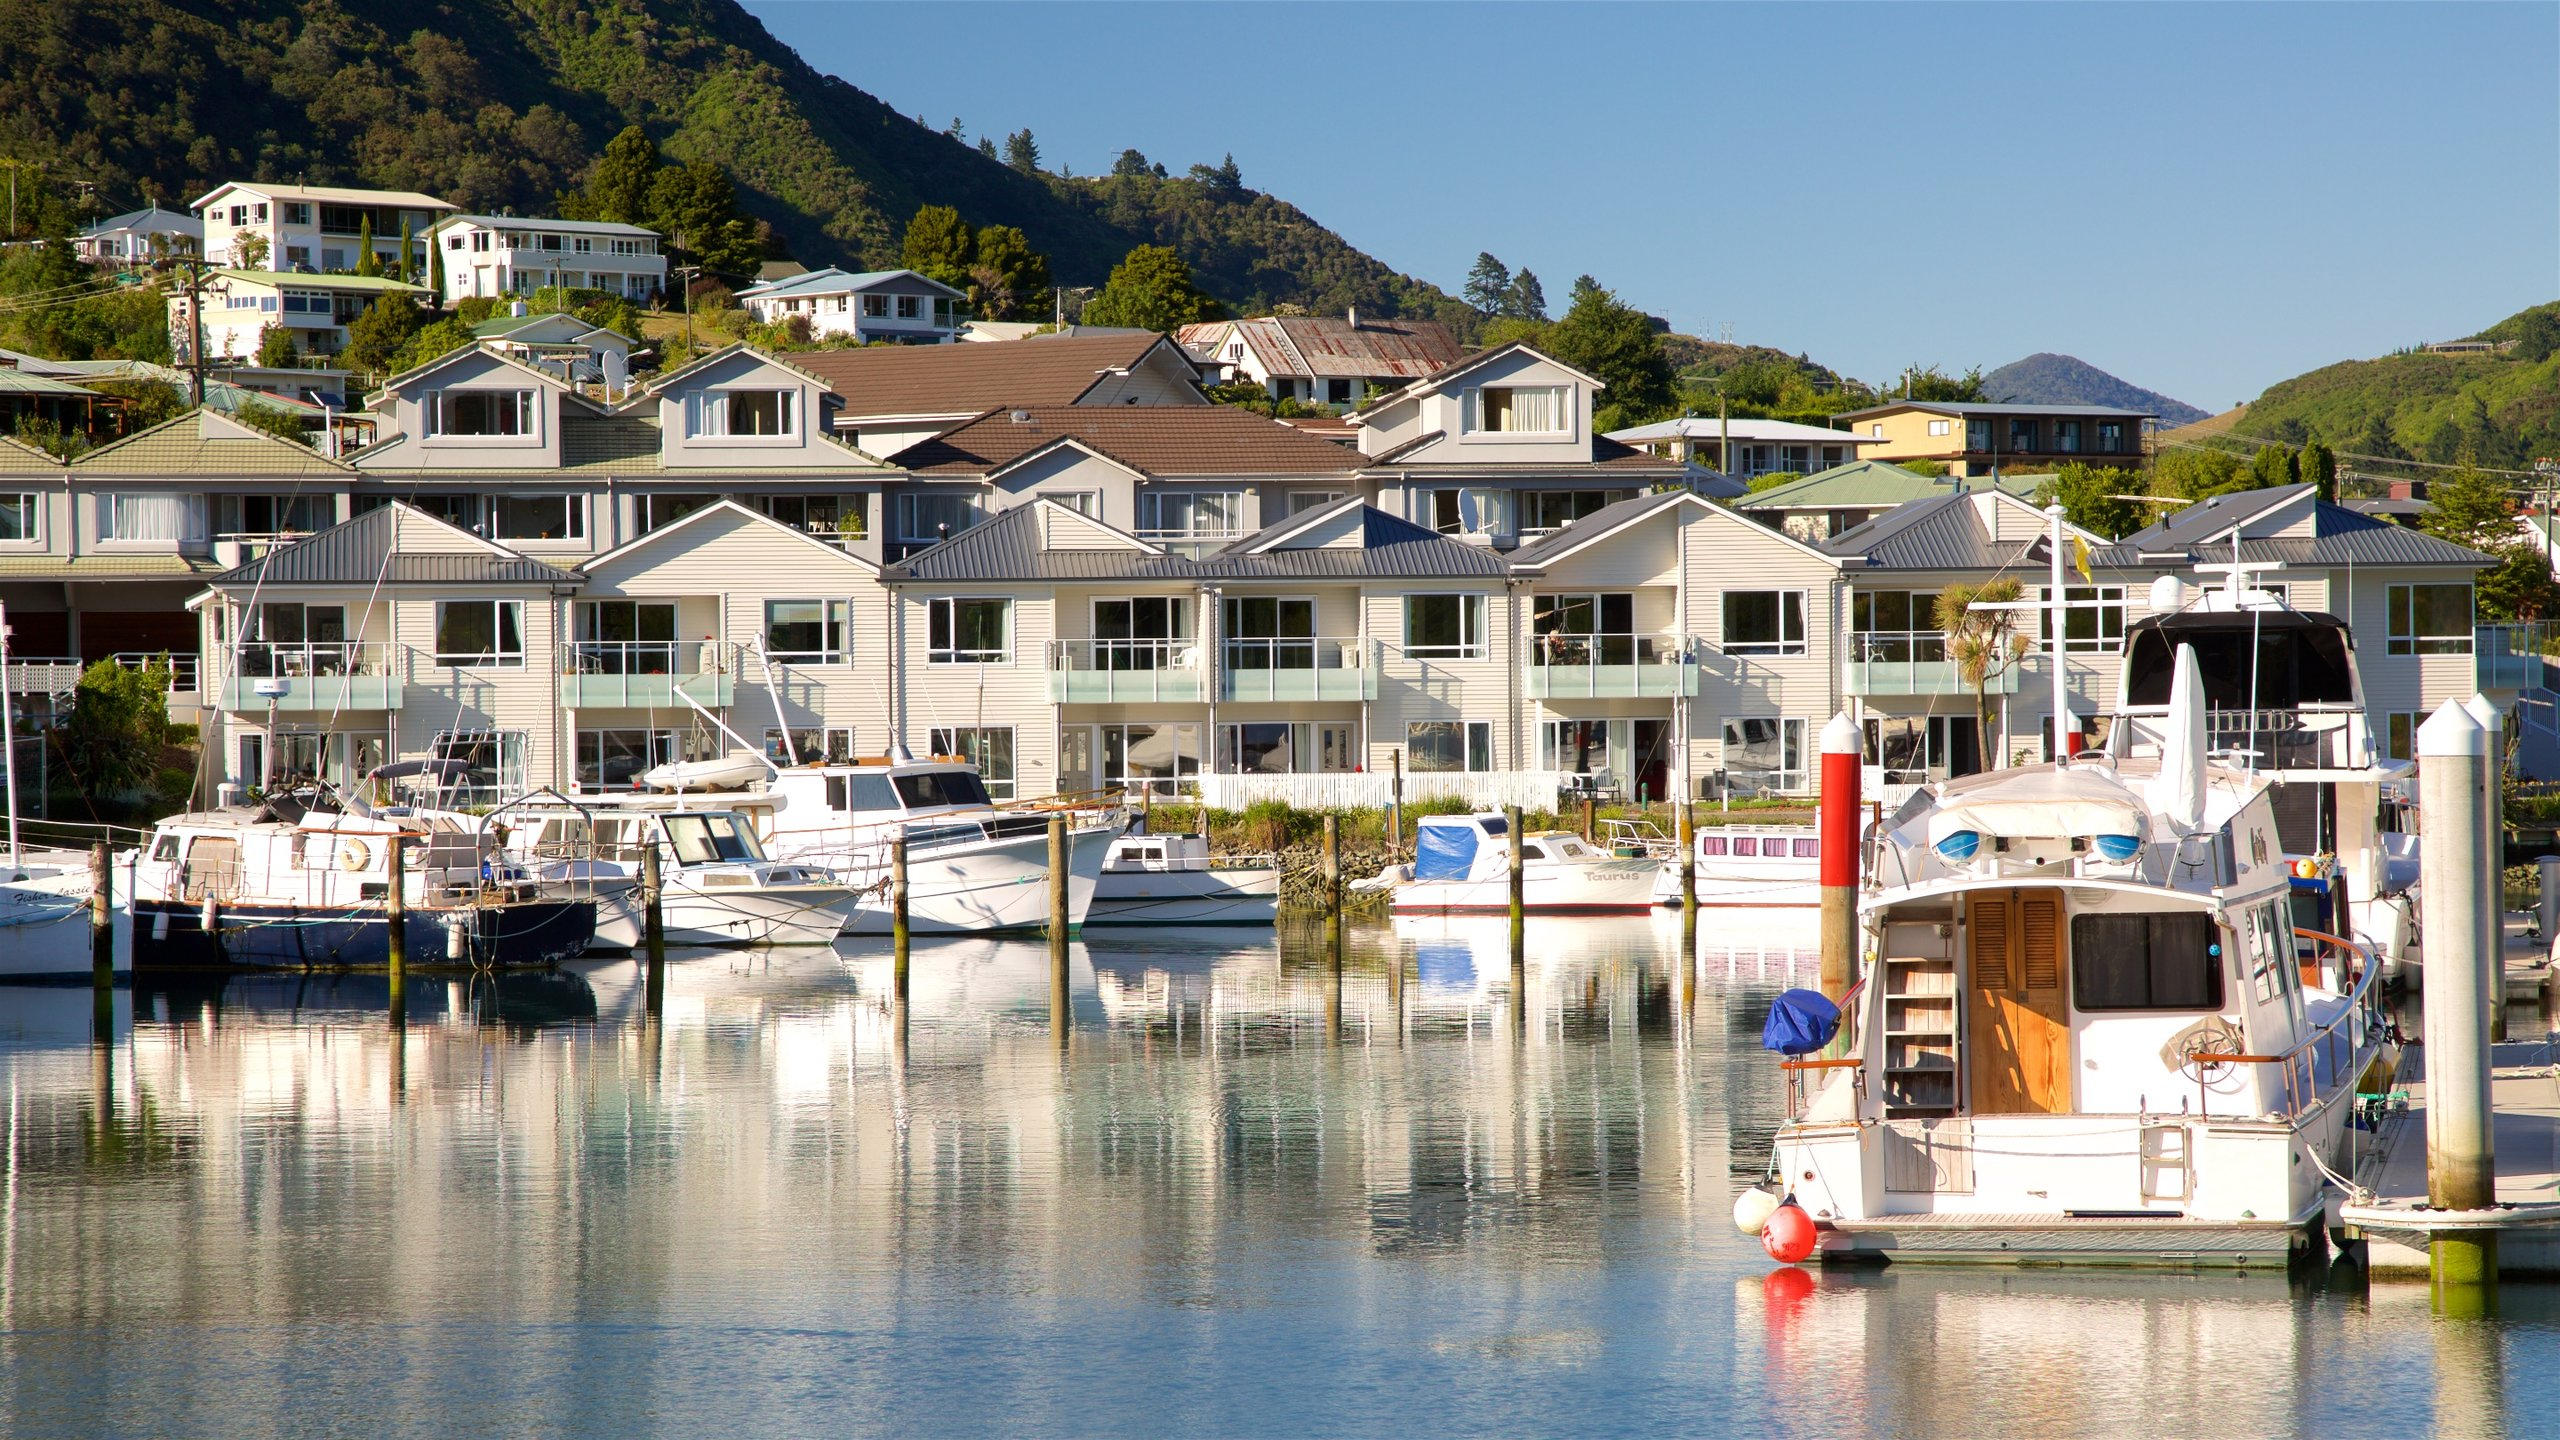 Picton, Marlborough, New Zealand